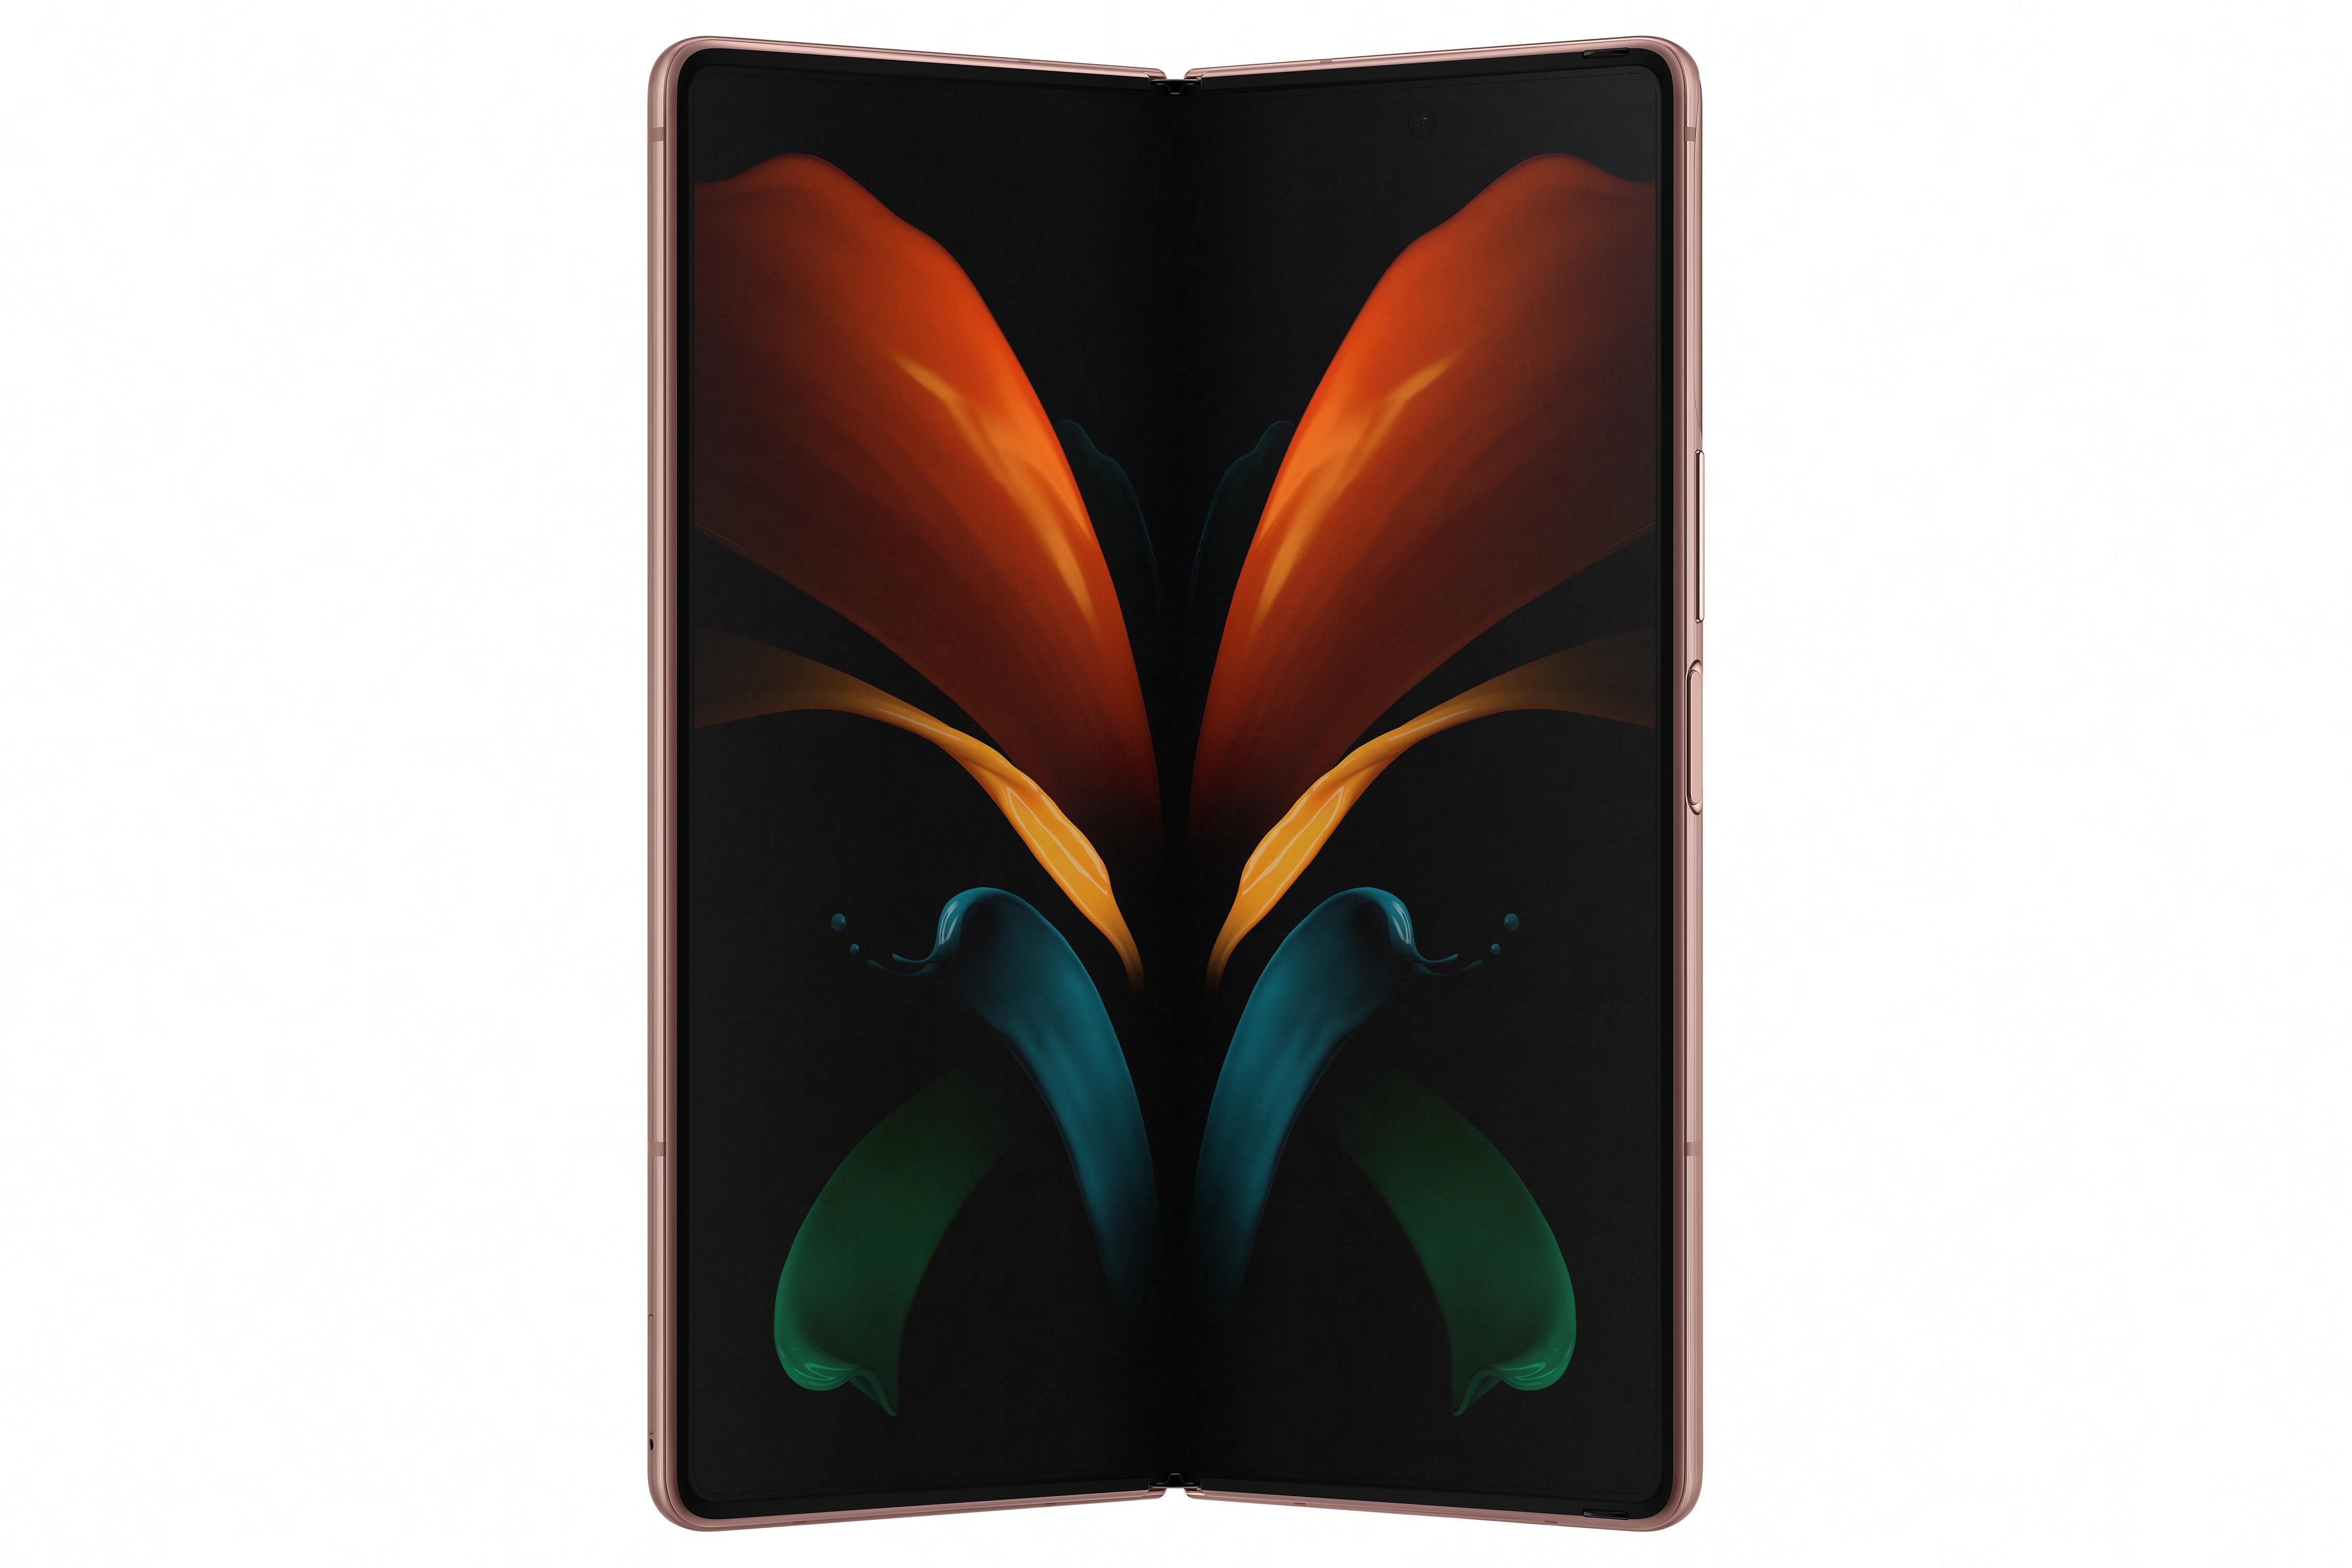 Galaxy Fold 2 - UNPACKED 2020